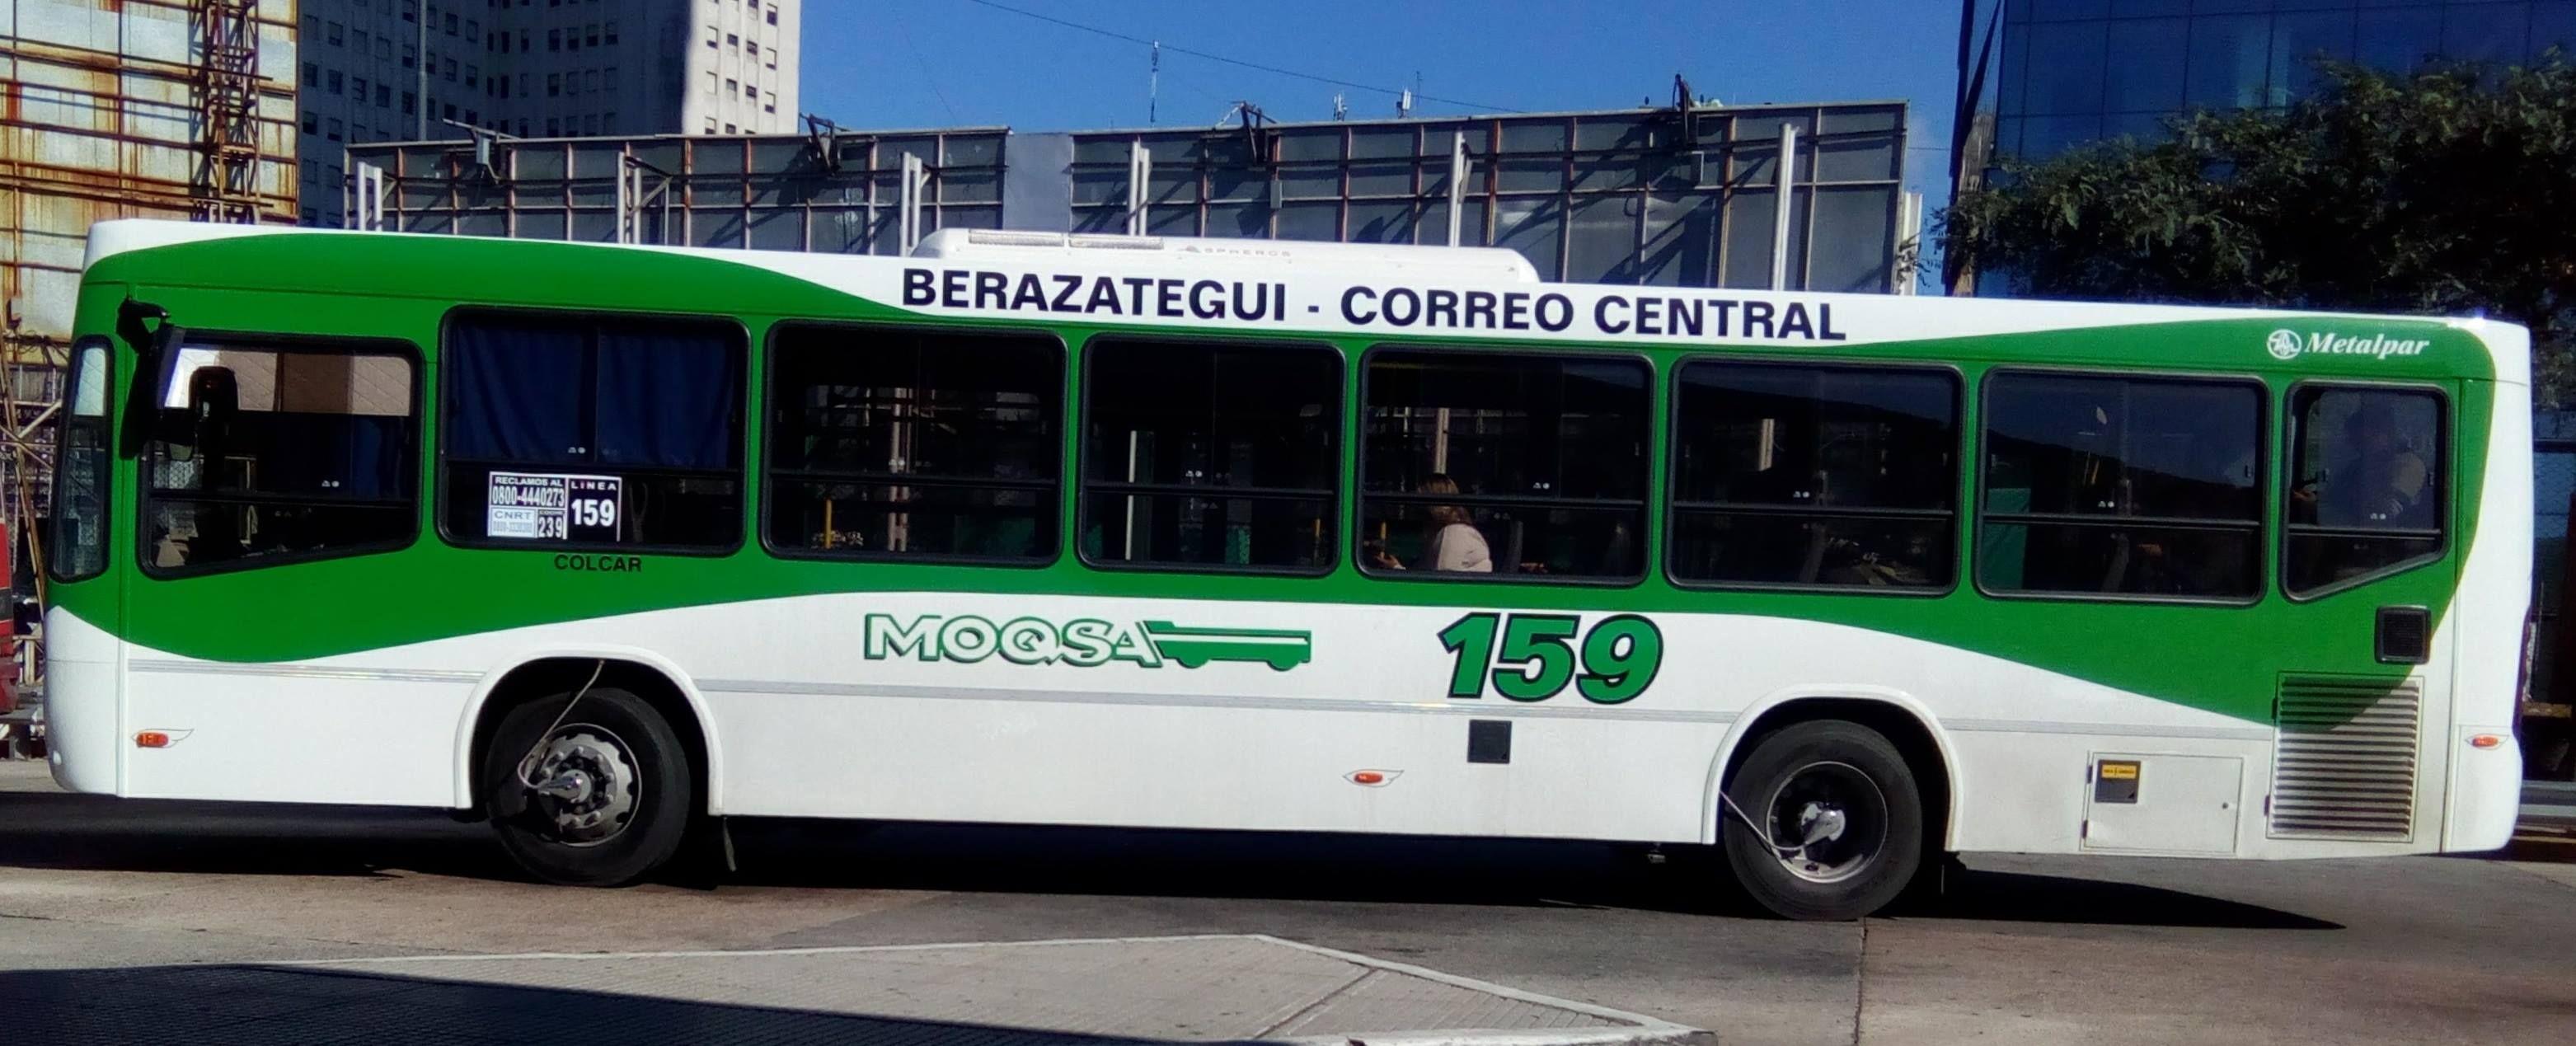 Línea 159